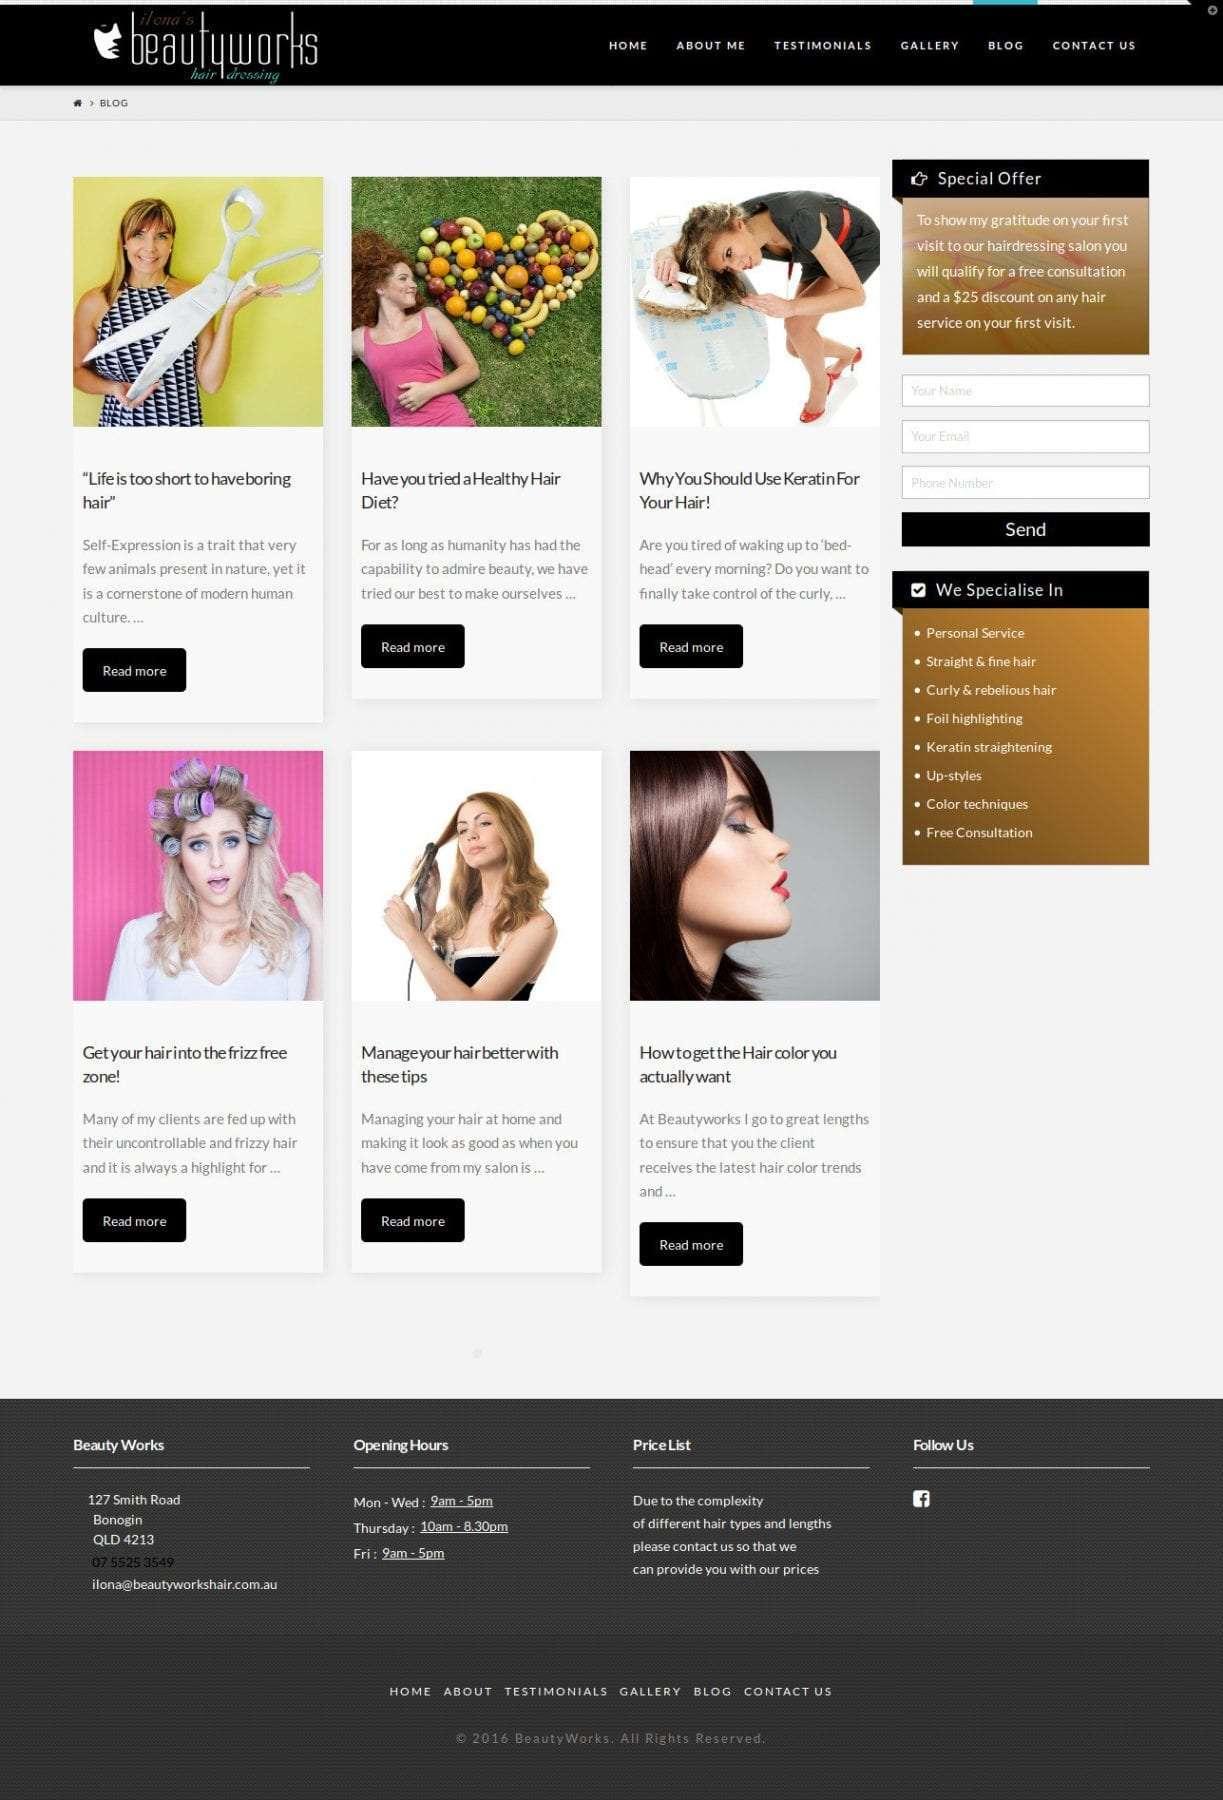 Beautyworks Blogs